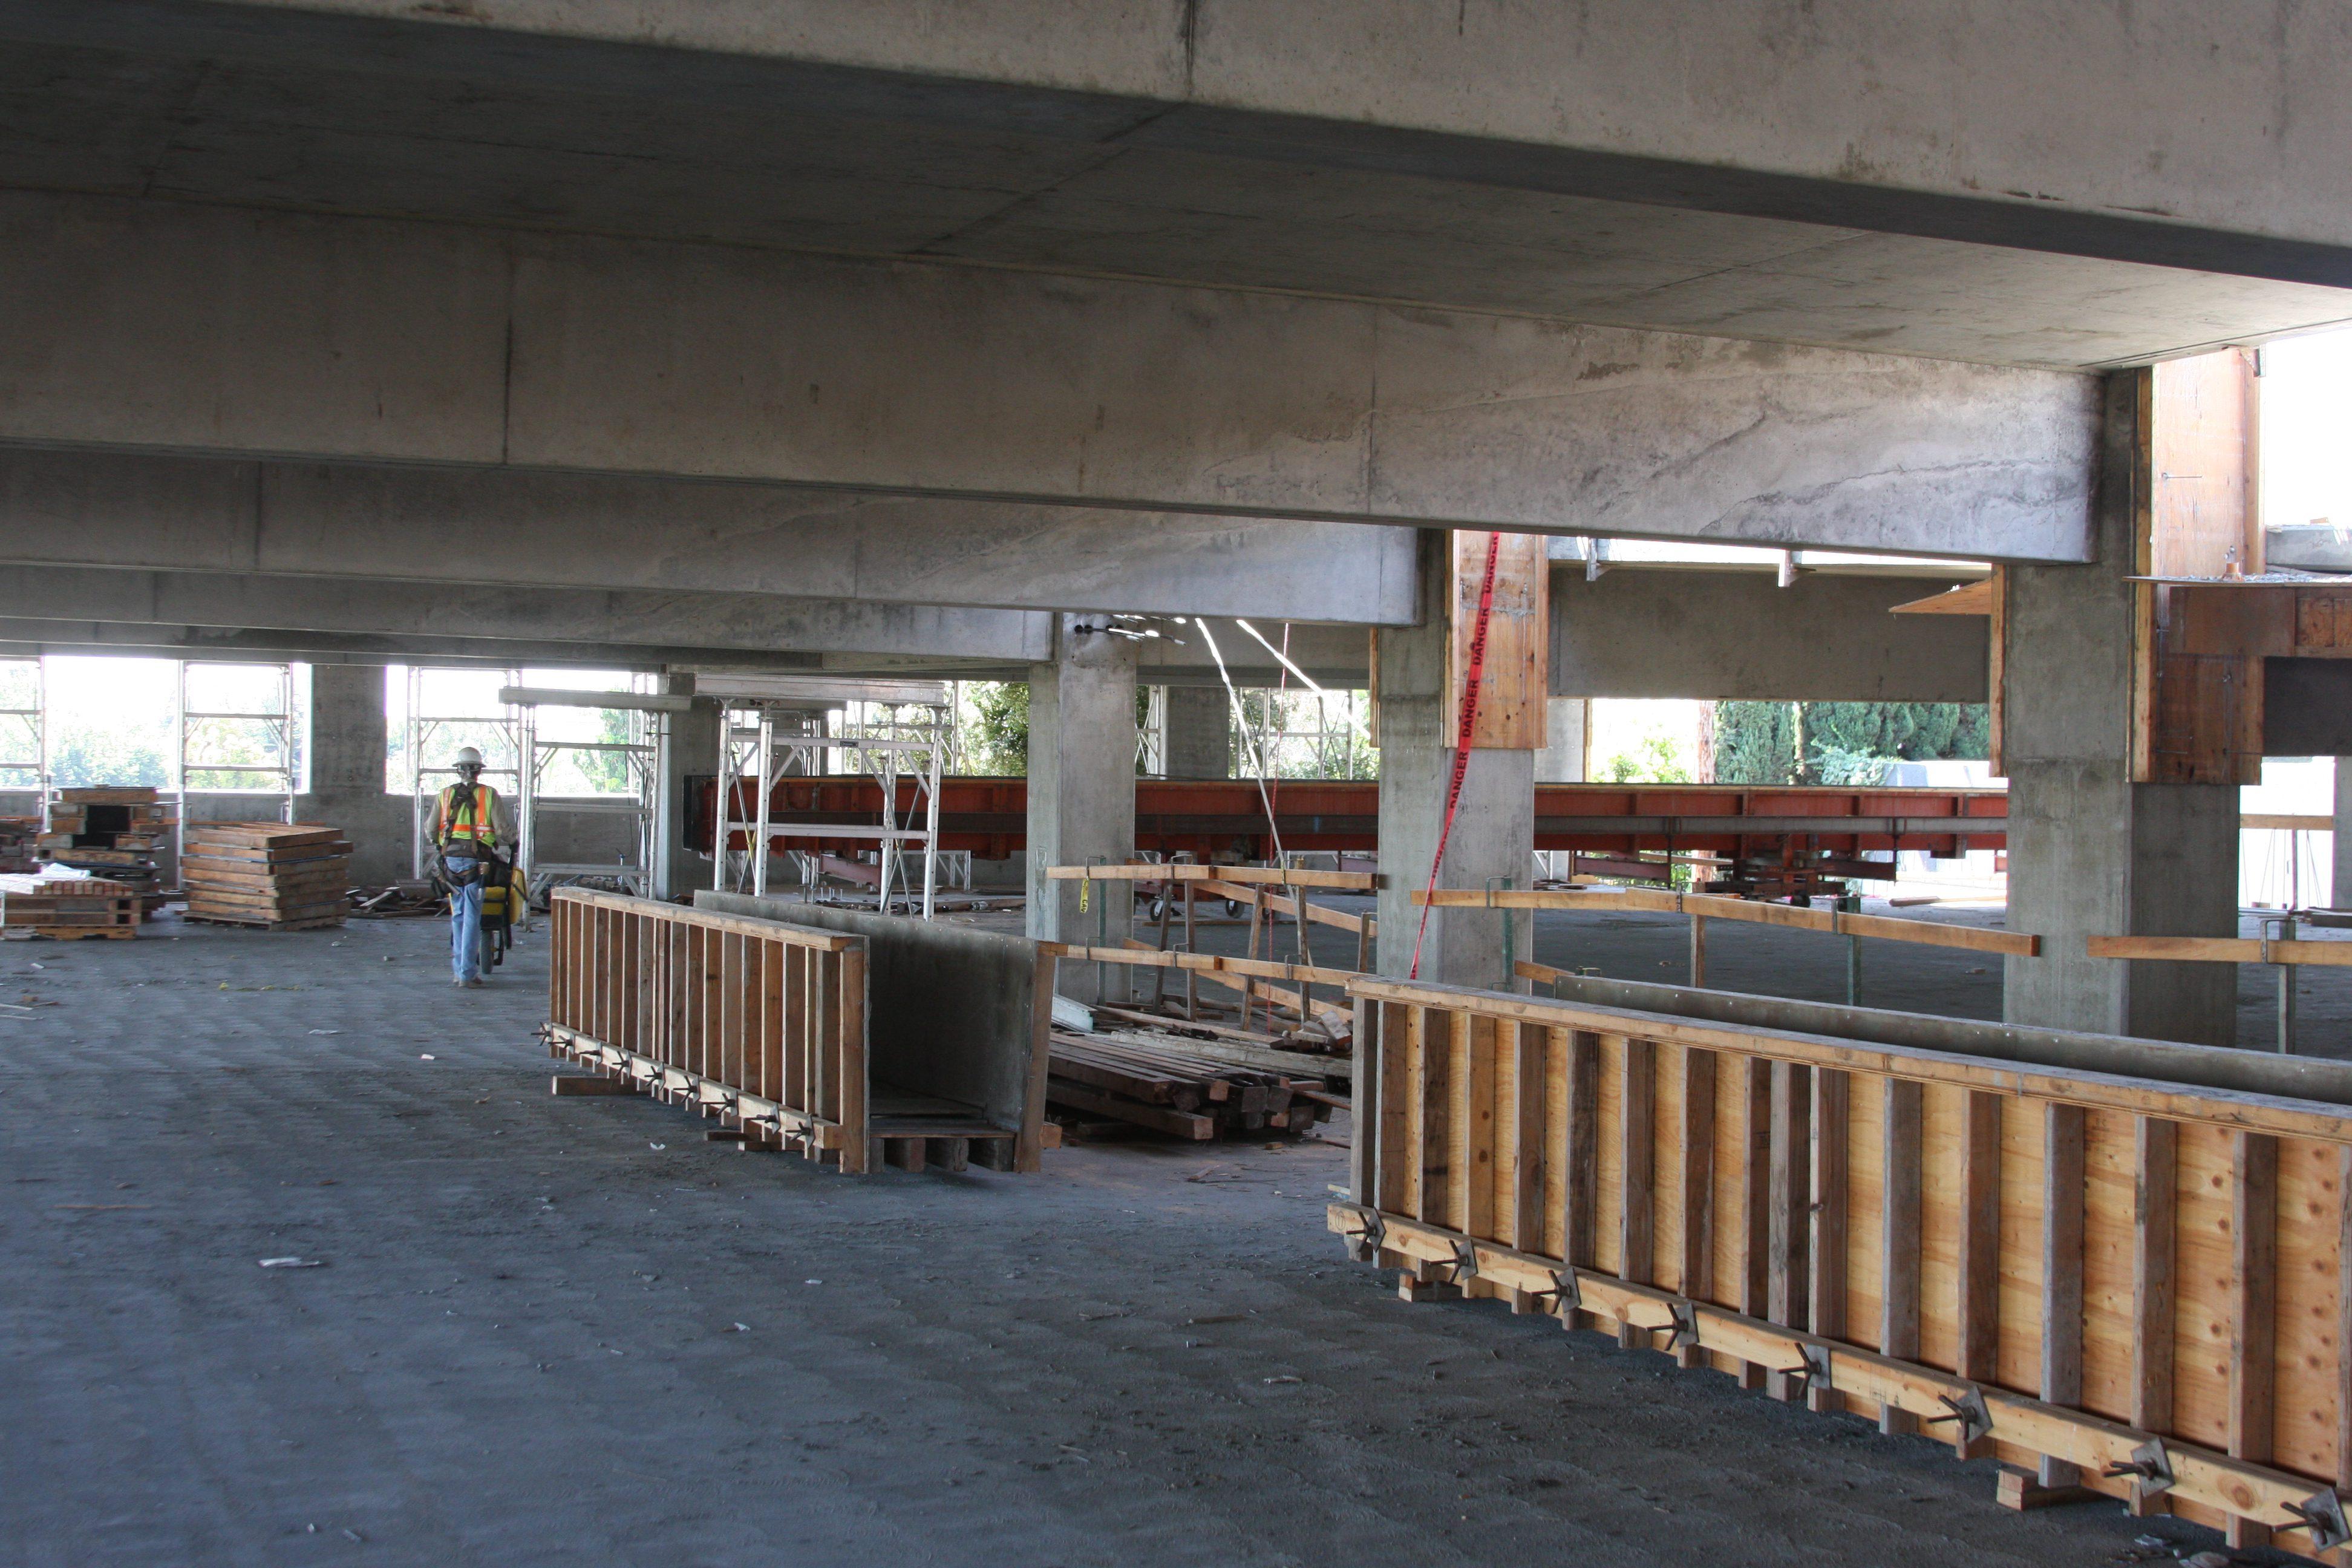 The parking garage at the Sepulveda station.